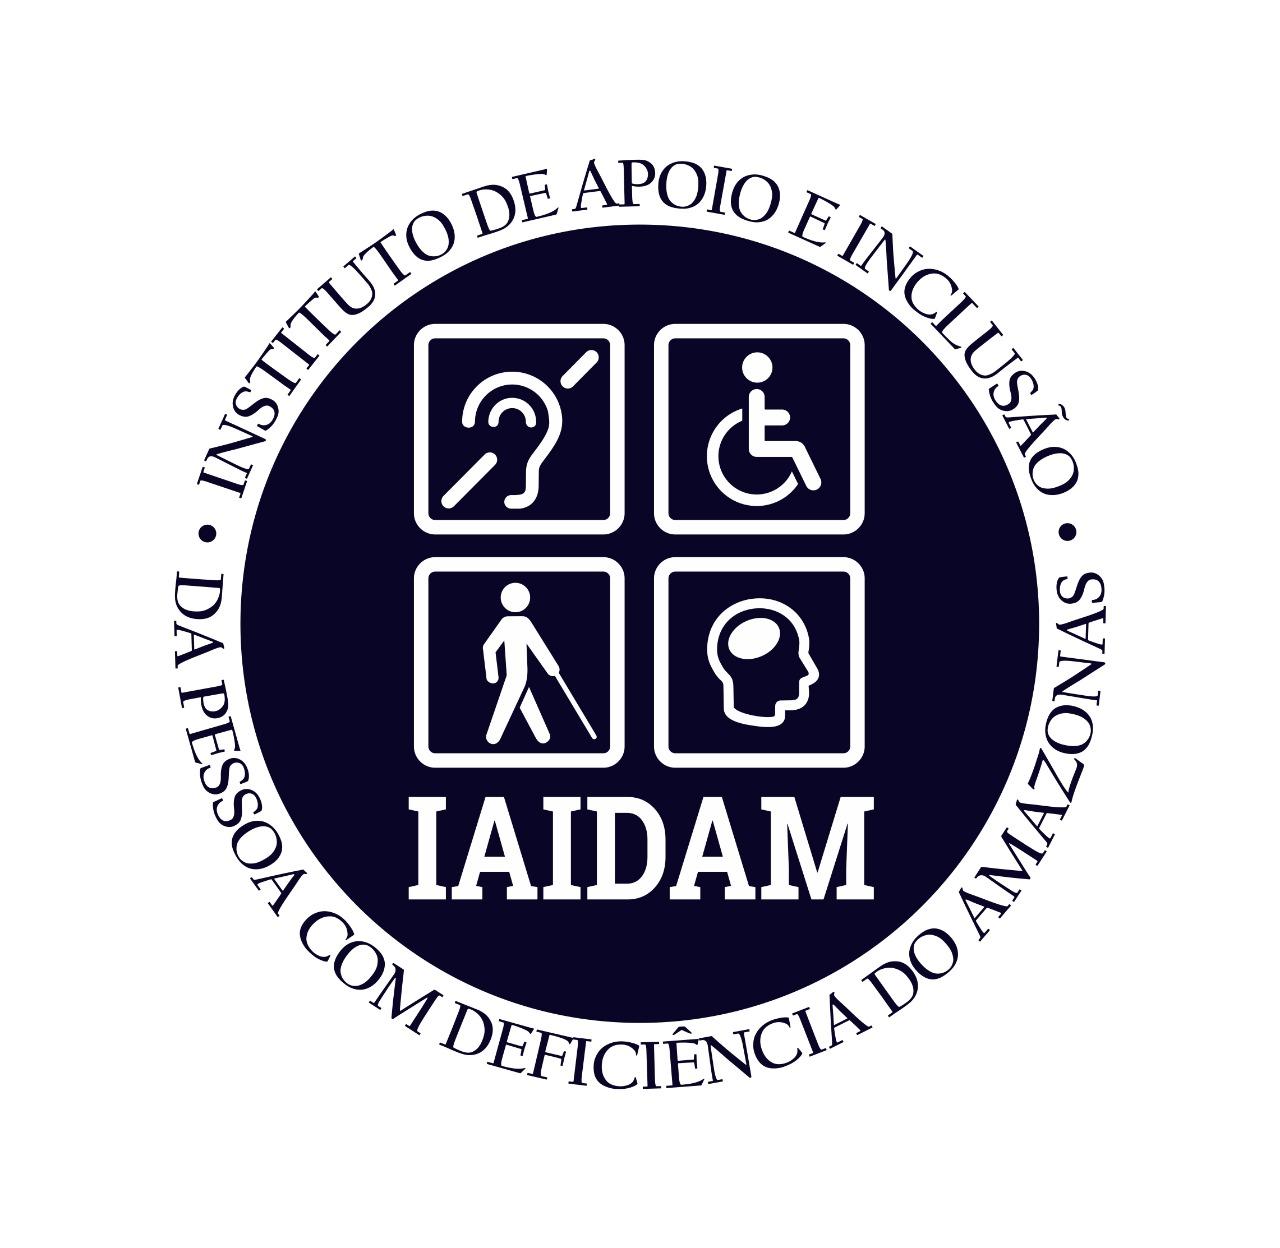 IAIDAM